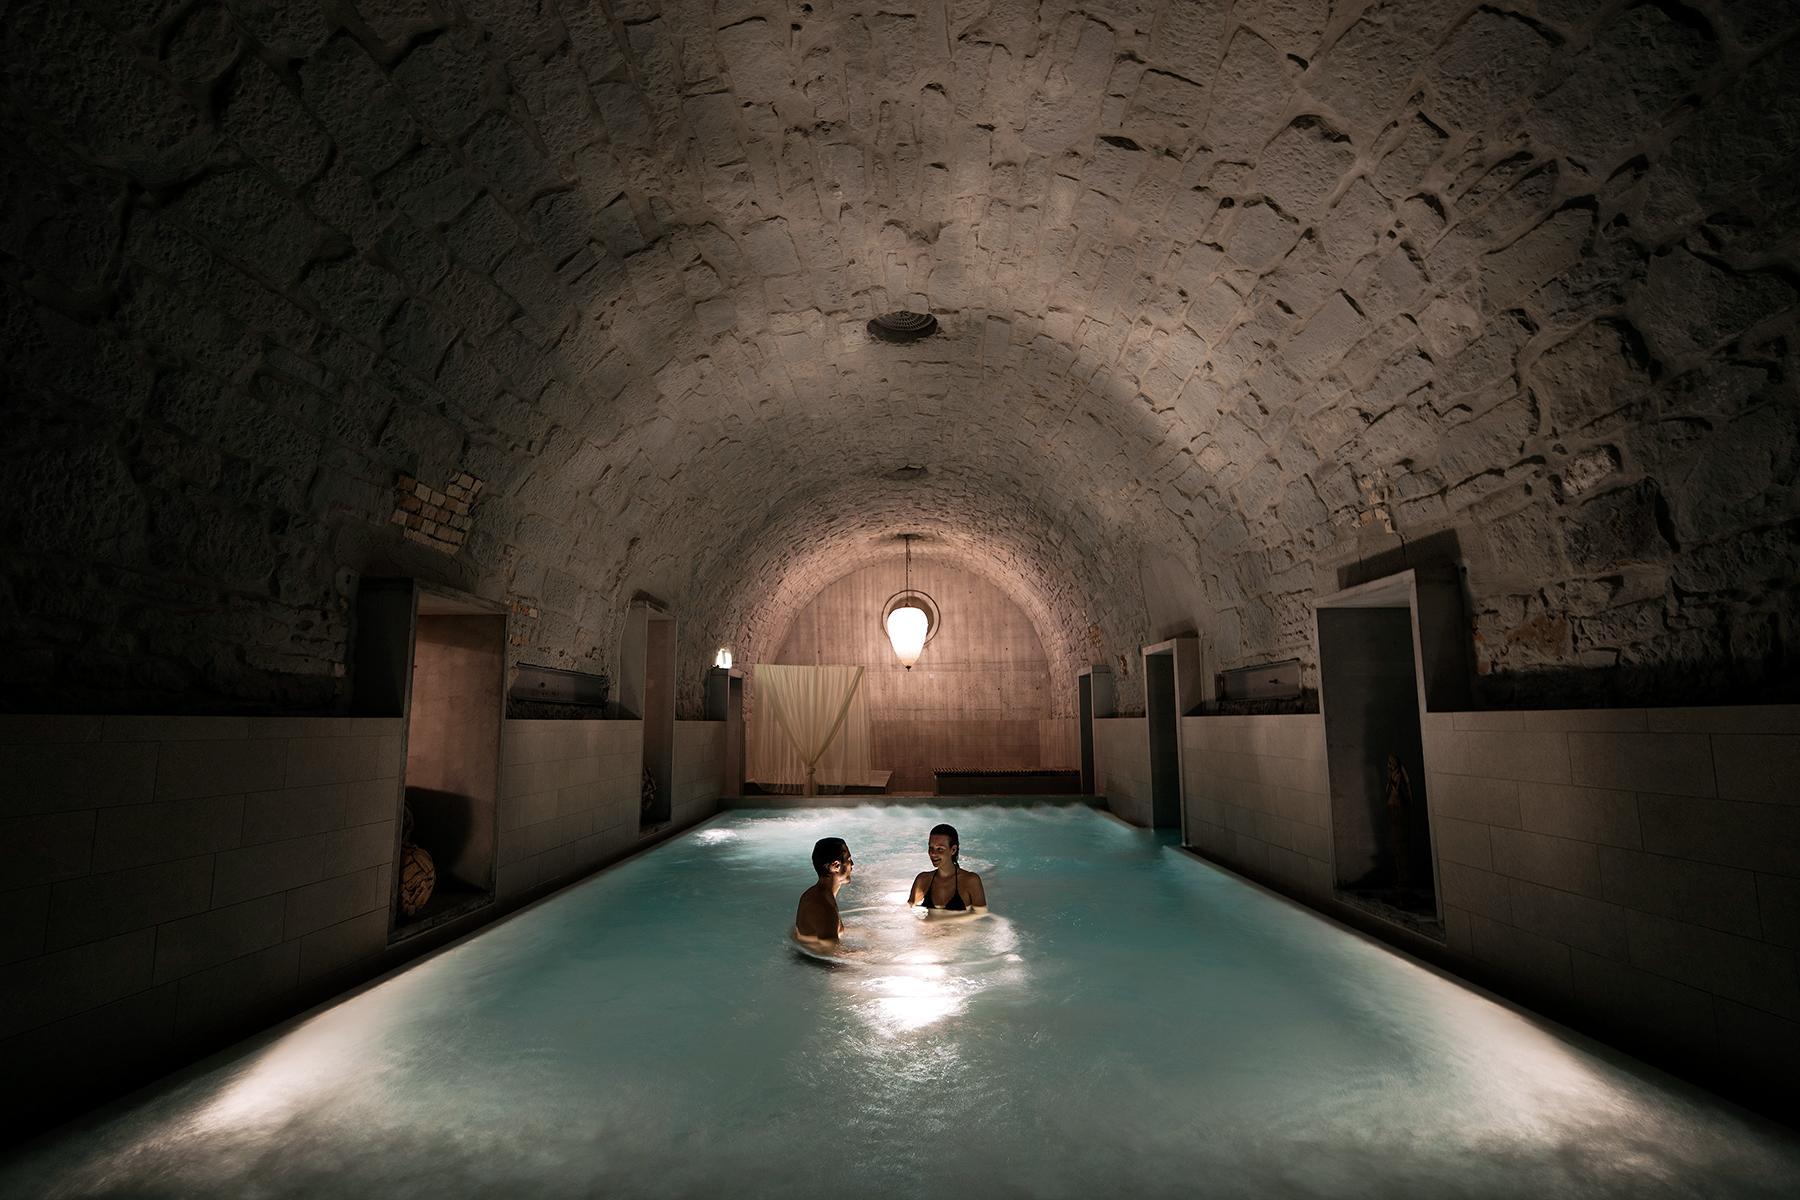 06_KinkyAmenities__B2BoutiqueHotel_6.) Copyright by Aqua Spa_Resorts_Thermalbath & Spa Zurich